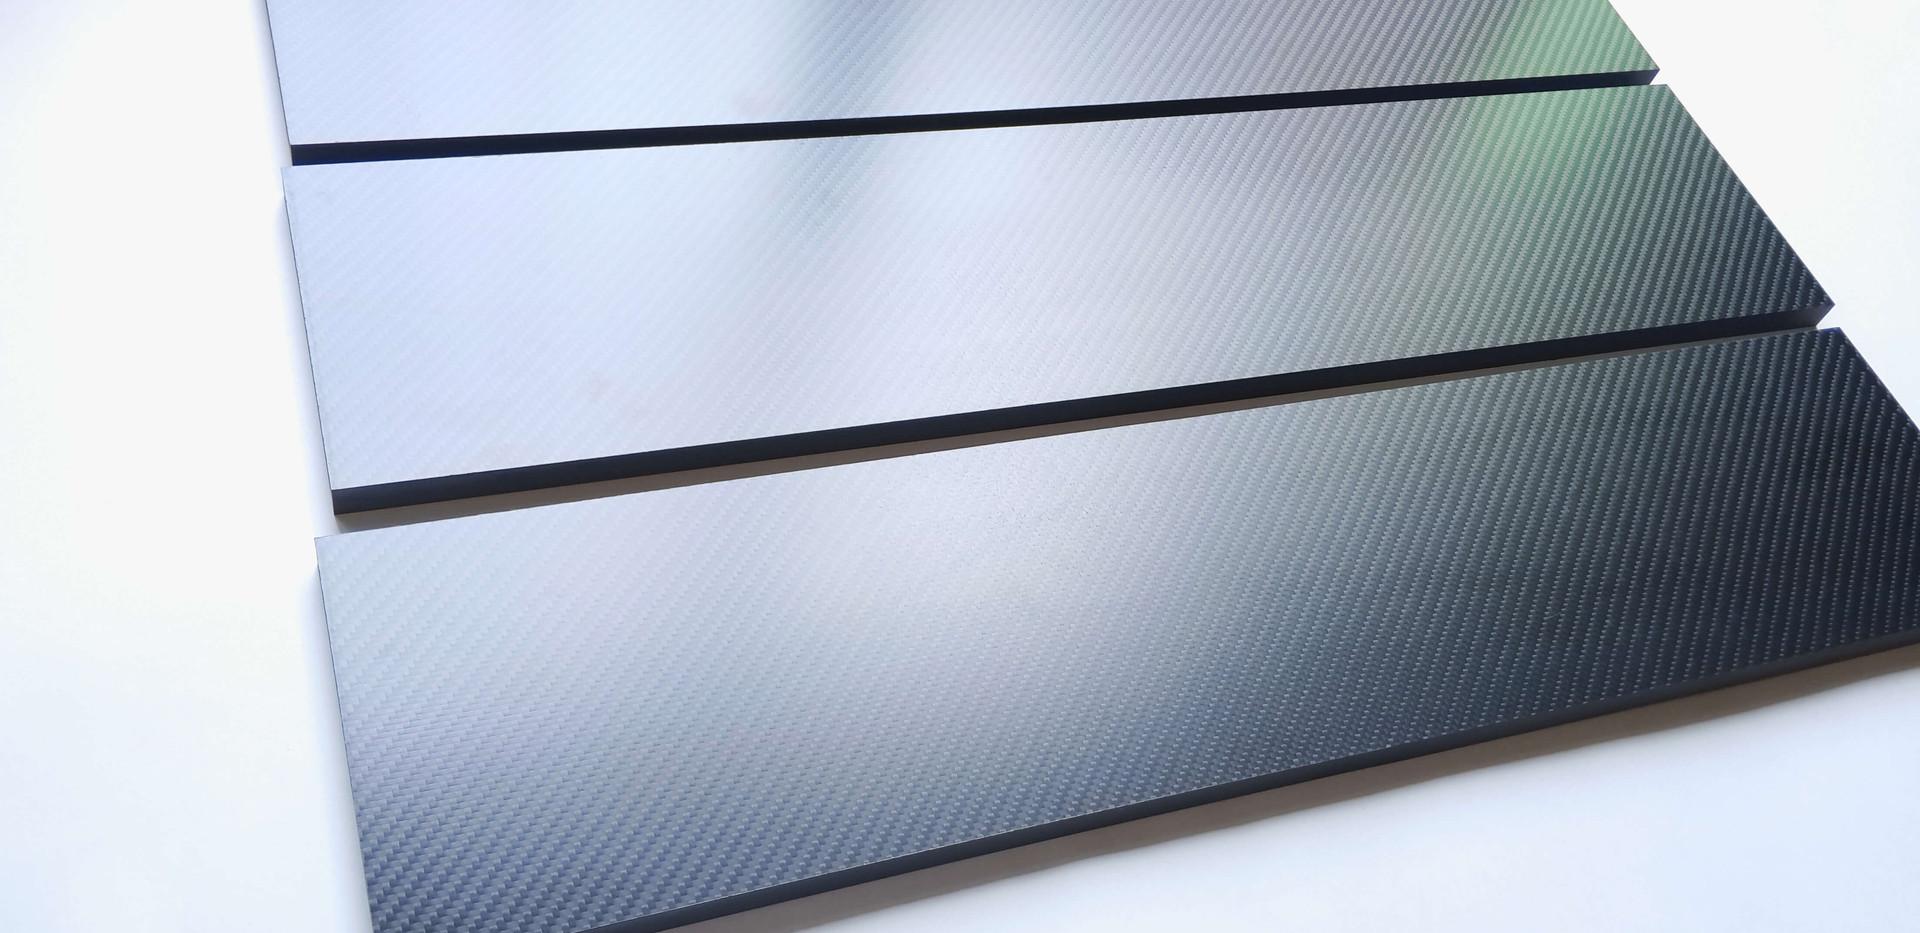 15mm carbon fiber sheet acen carbon fiber plate sheet   thick carbon fiber laminate panel